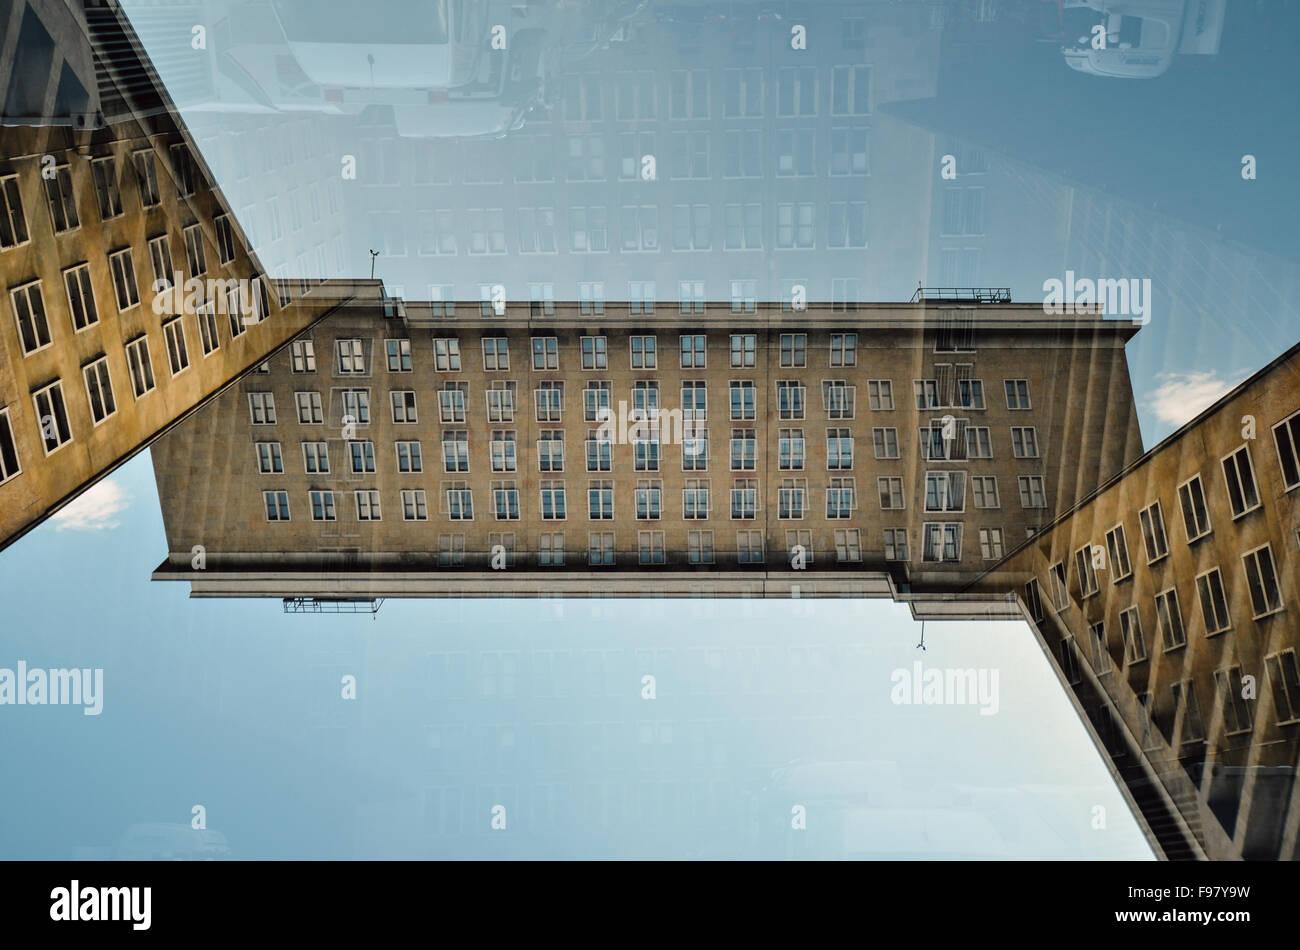 Digital Composite Image Of Building - Stock Image